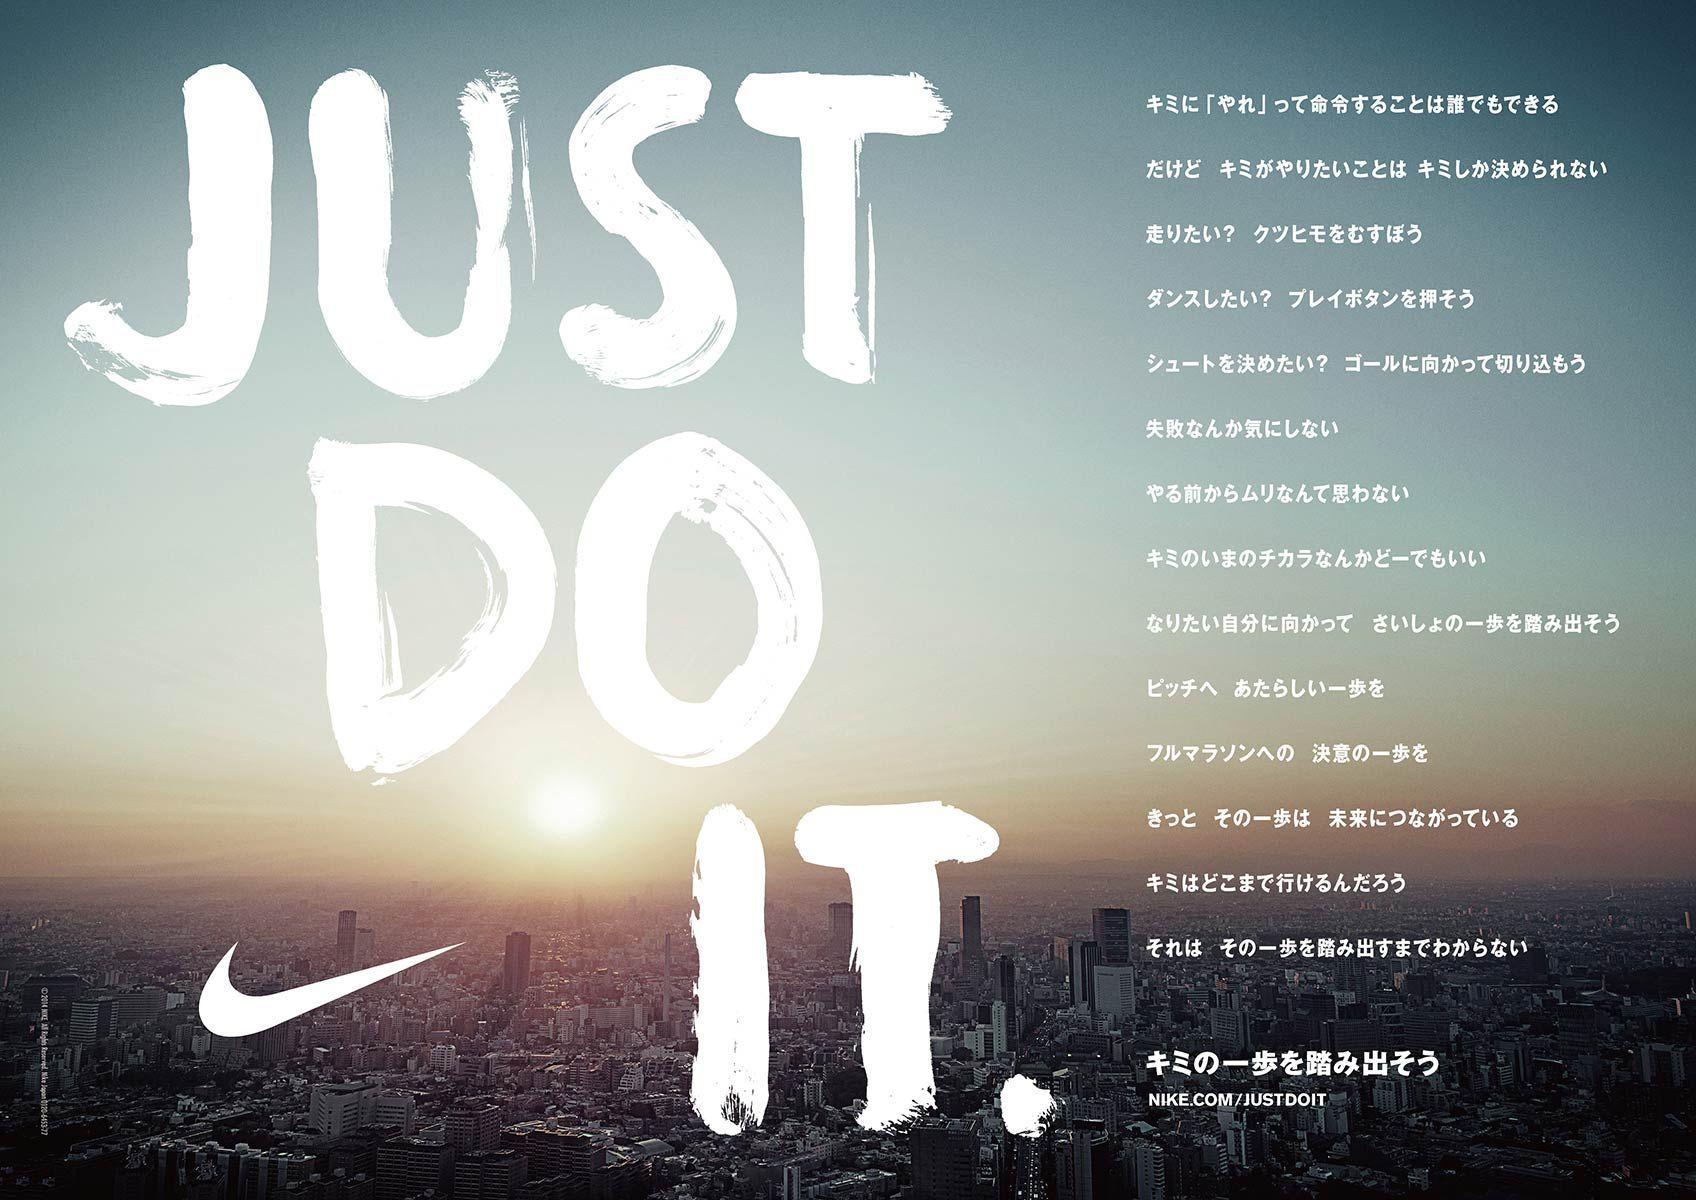 Nike 企業 年賀状, ナイキ広告, Nike 広告